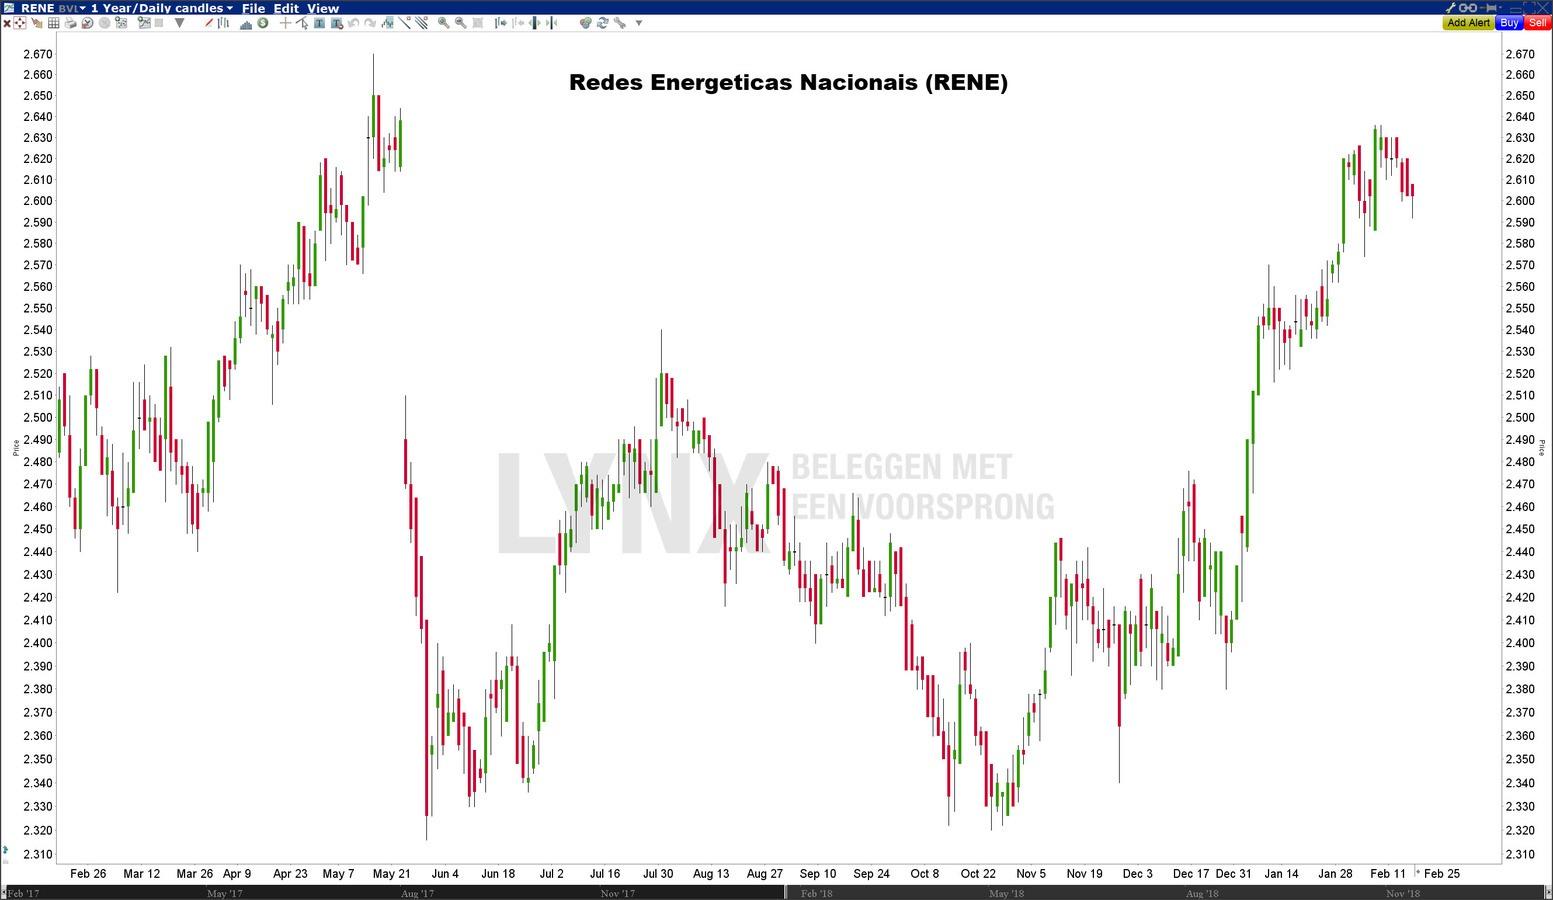 Redes Energeticas Nacionals (RENE) - Beste Europese dividendaandelen